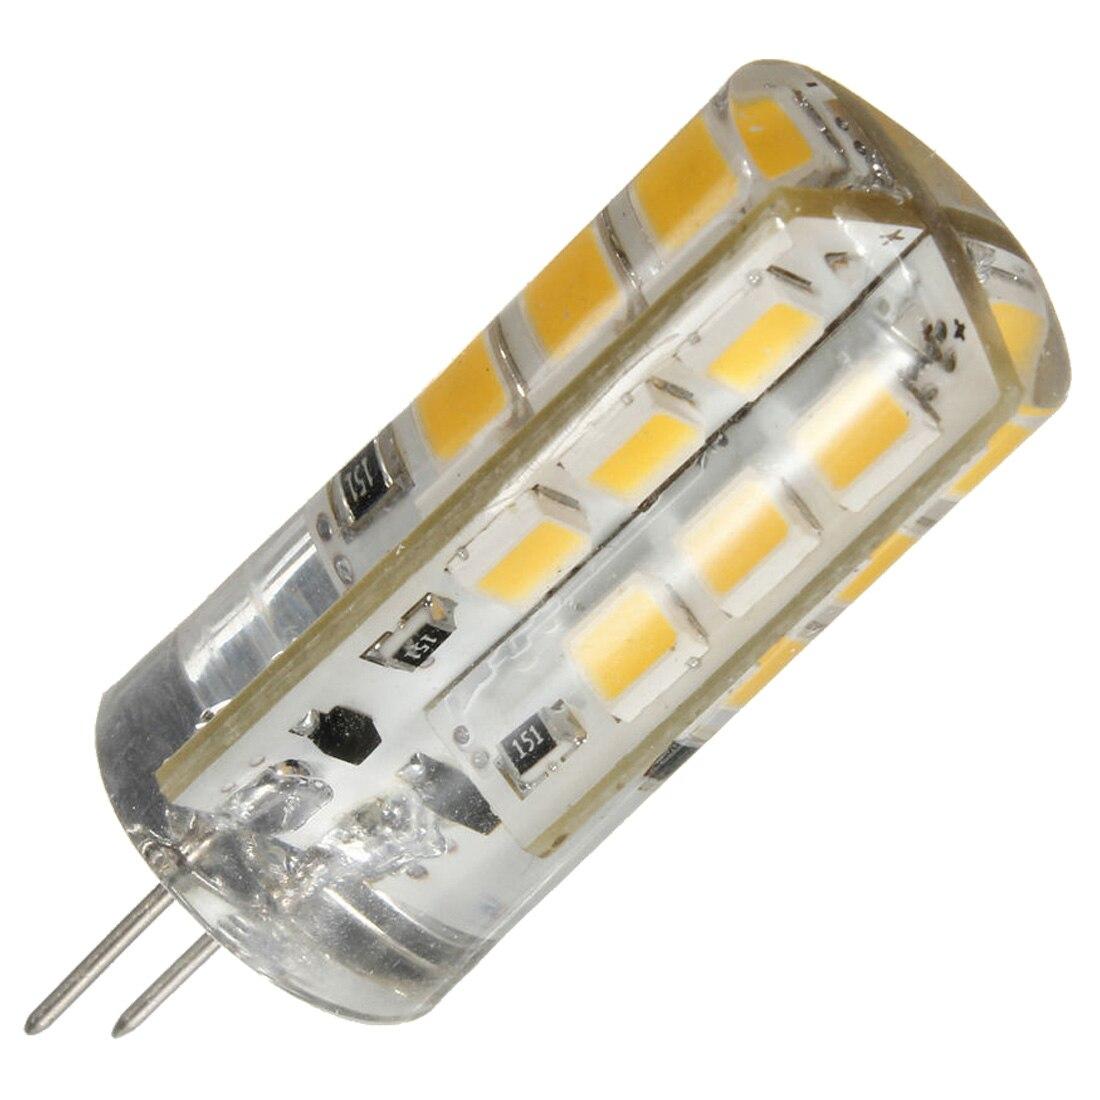 1 Pcs G4 3W 2835SMD 24 LED LIGHT SILICONE CAPSULE REPLACE HALOGEN BULB LIGHT 12V White Light 360 Degrees Beam Angle